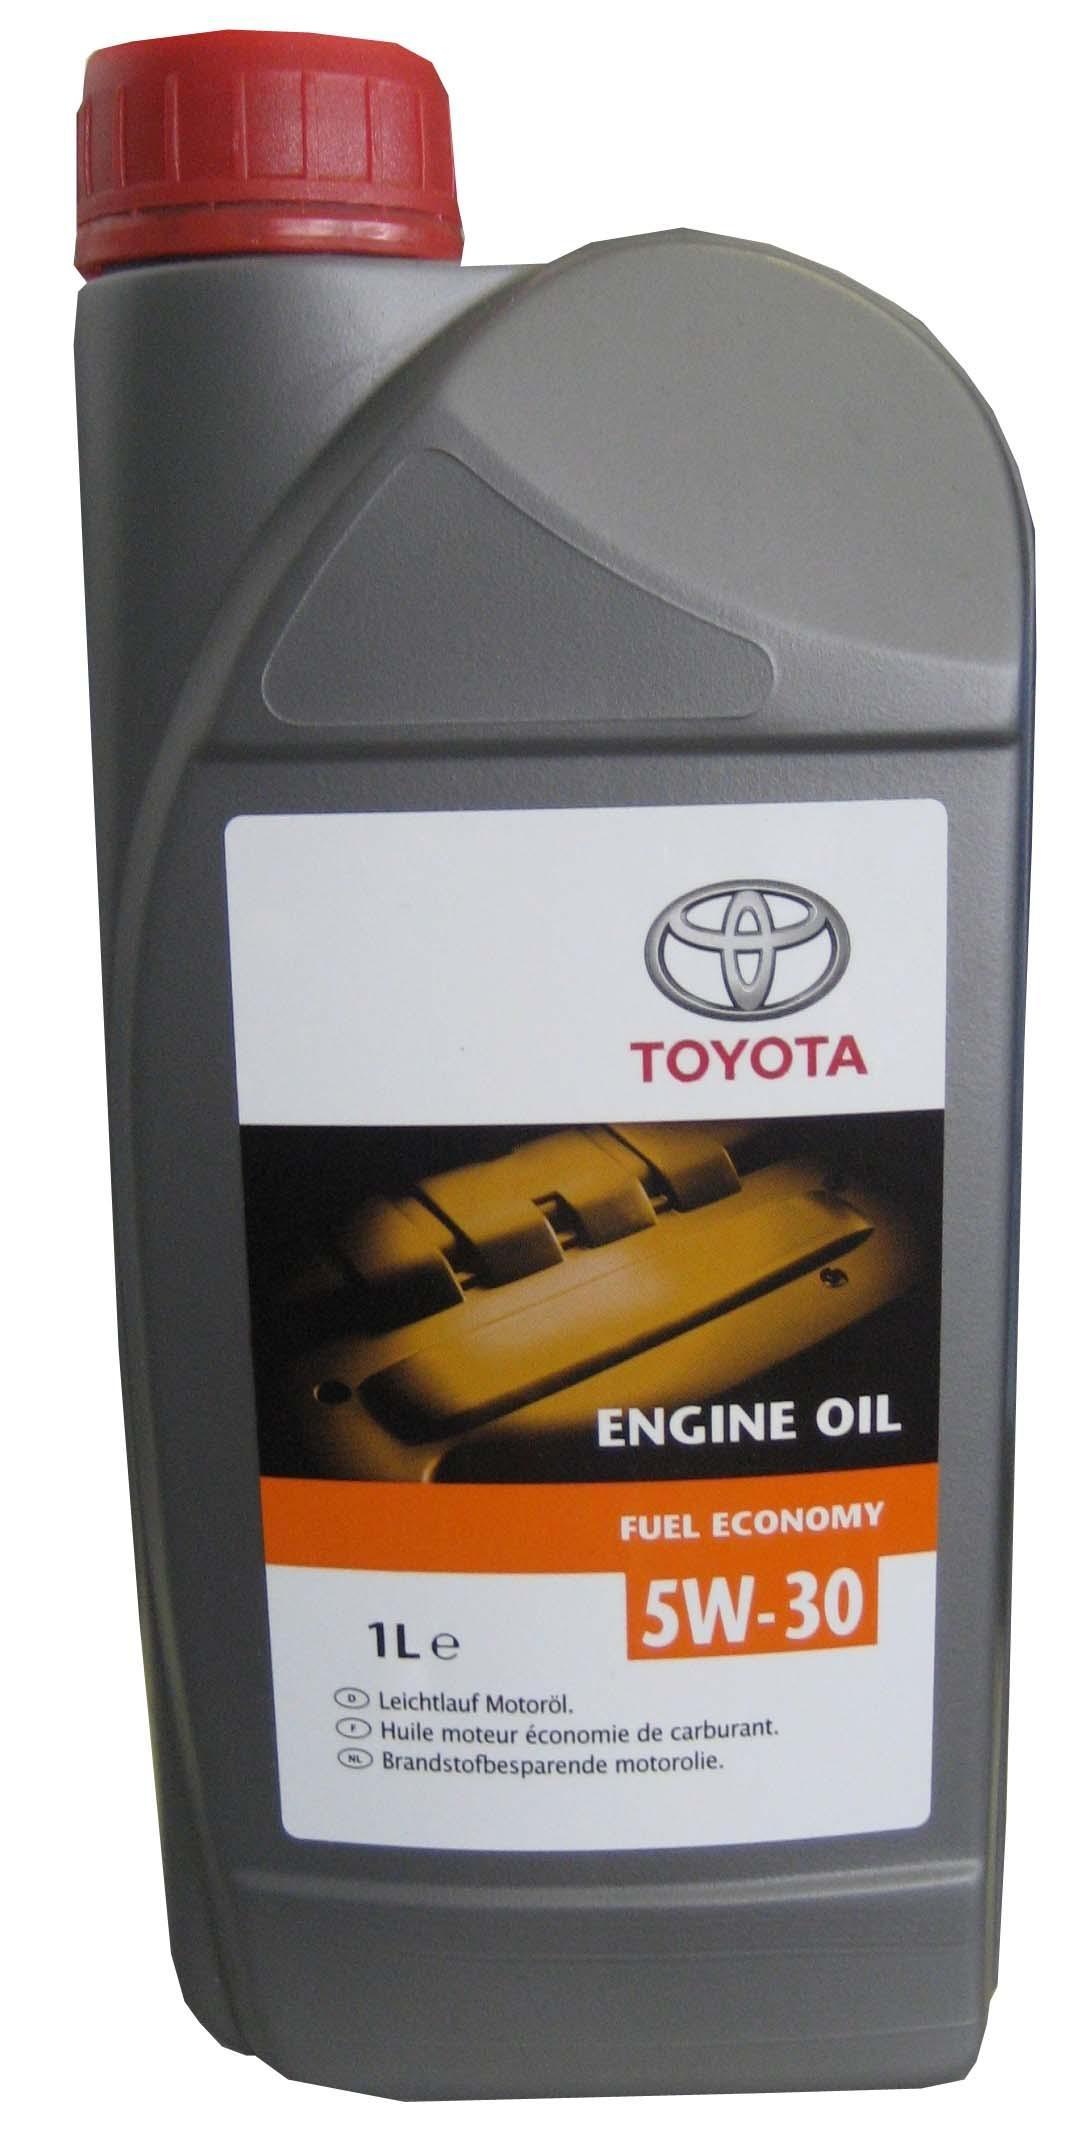 Моторное масло Toyota 5W-30 (08880-80846) 1л